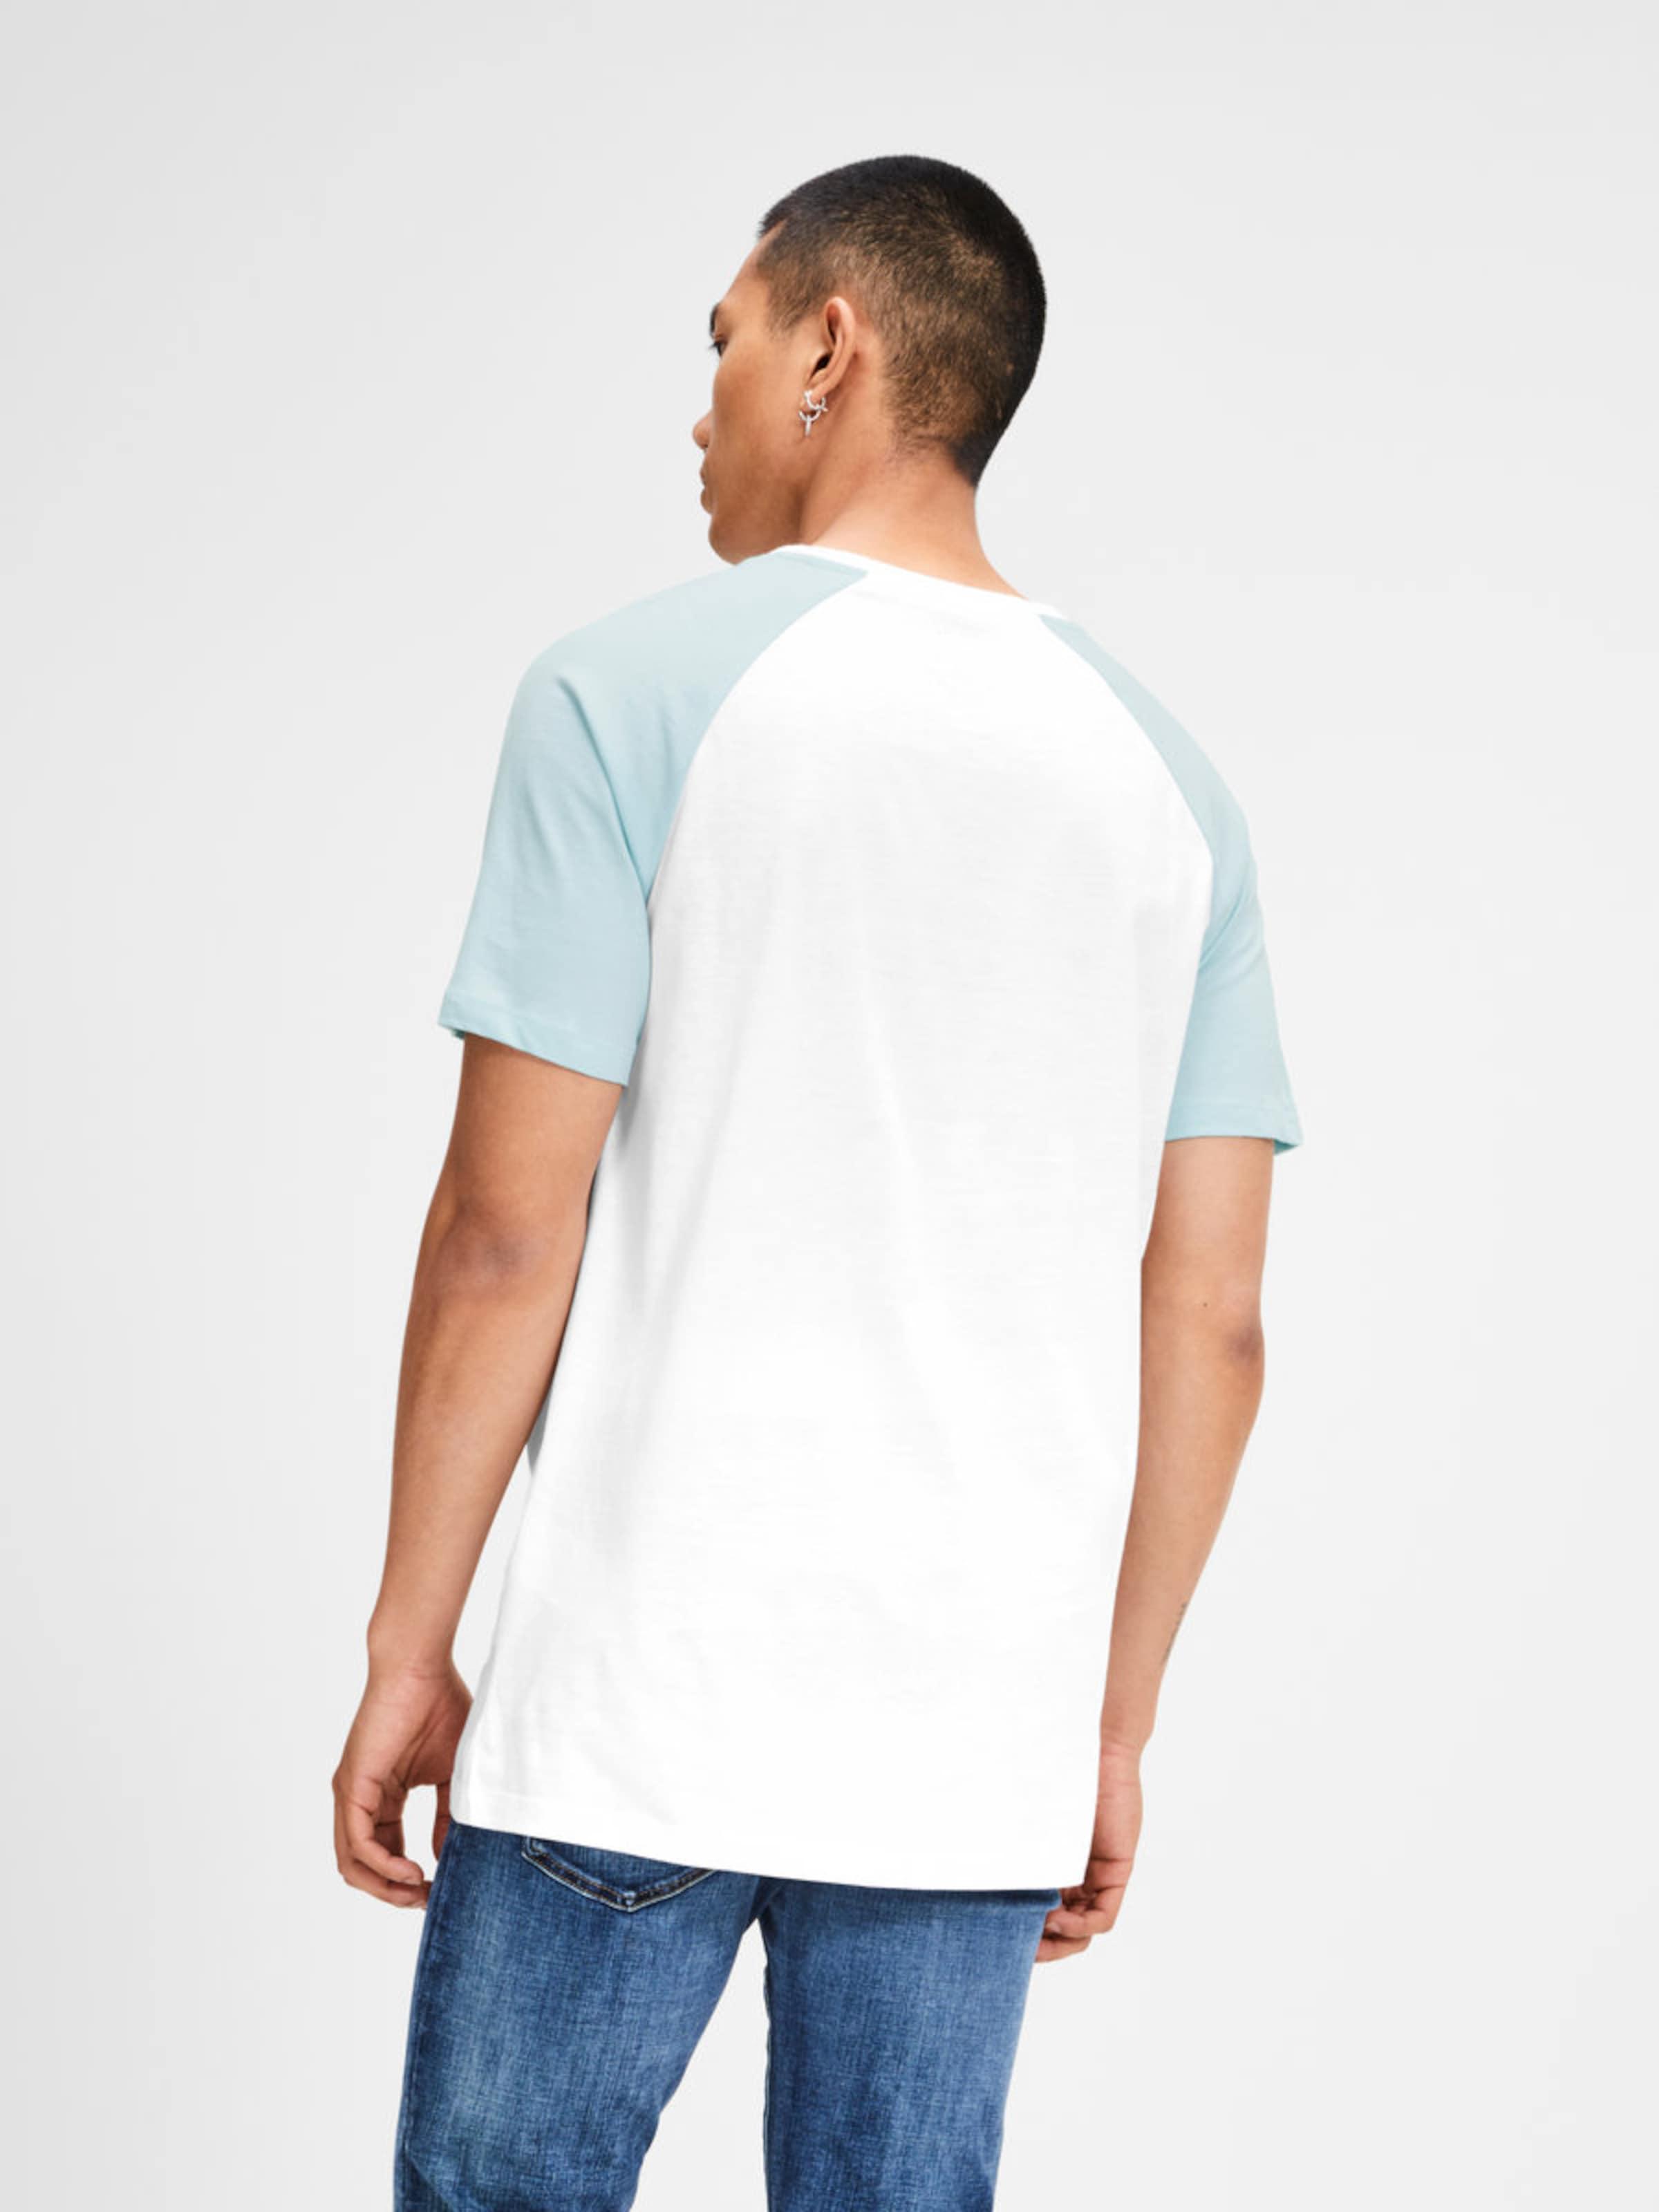 T Jones En ClairBlanc shirt Bleu Jackamp; kXuPZTOi